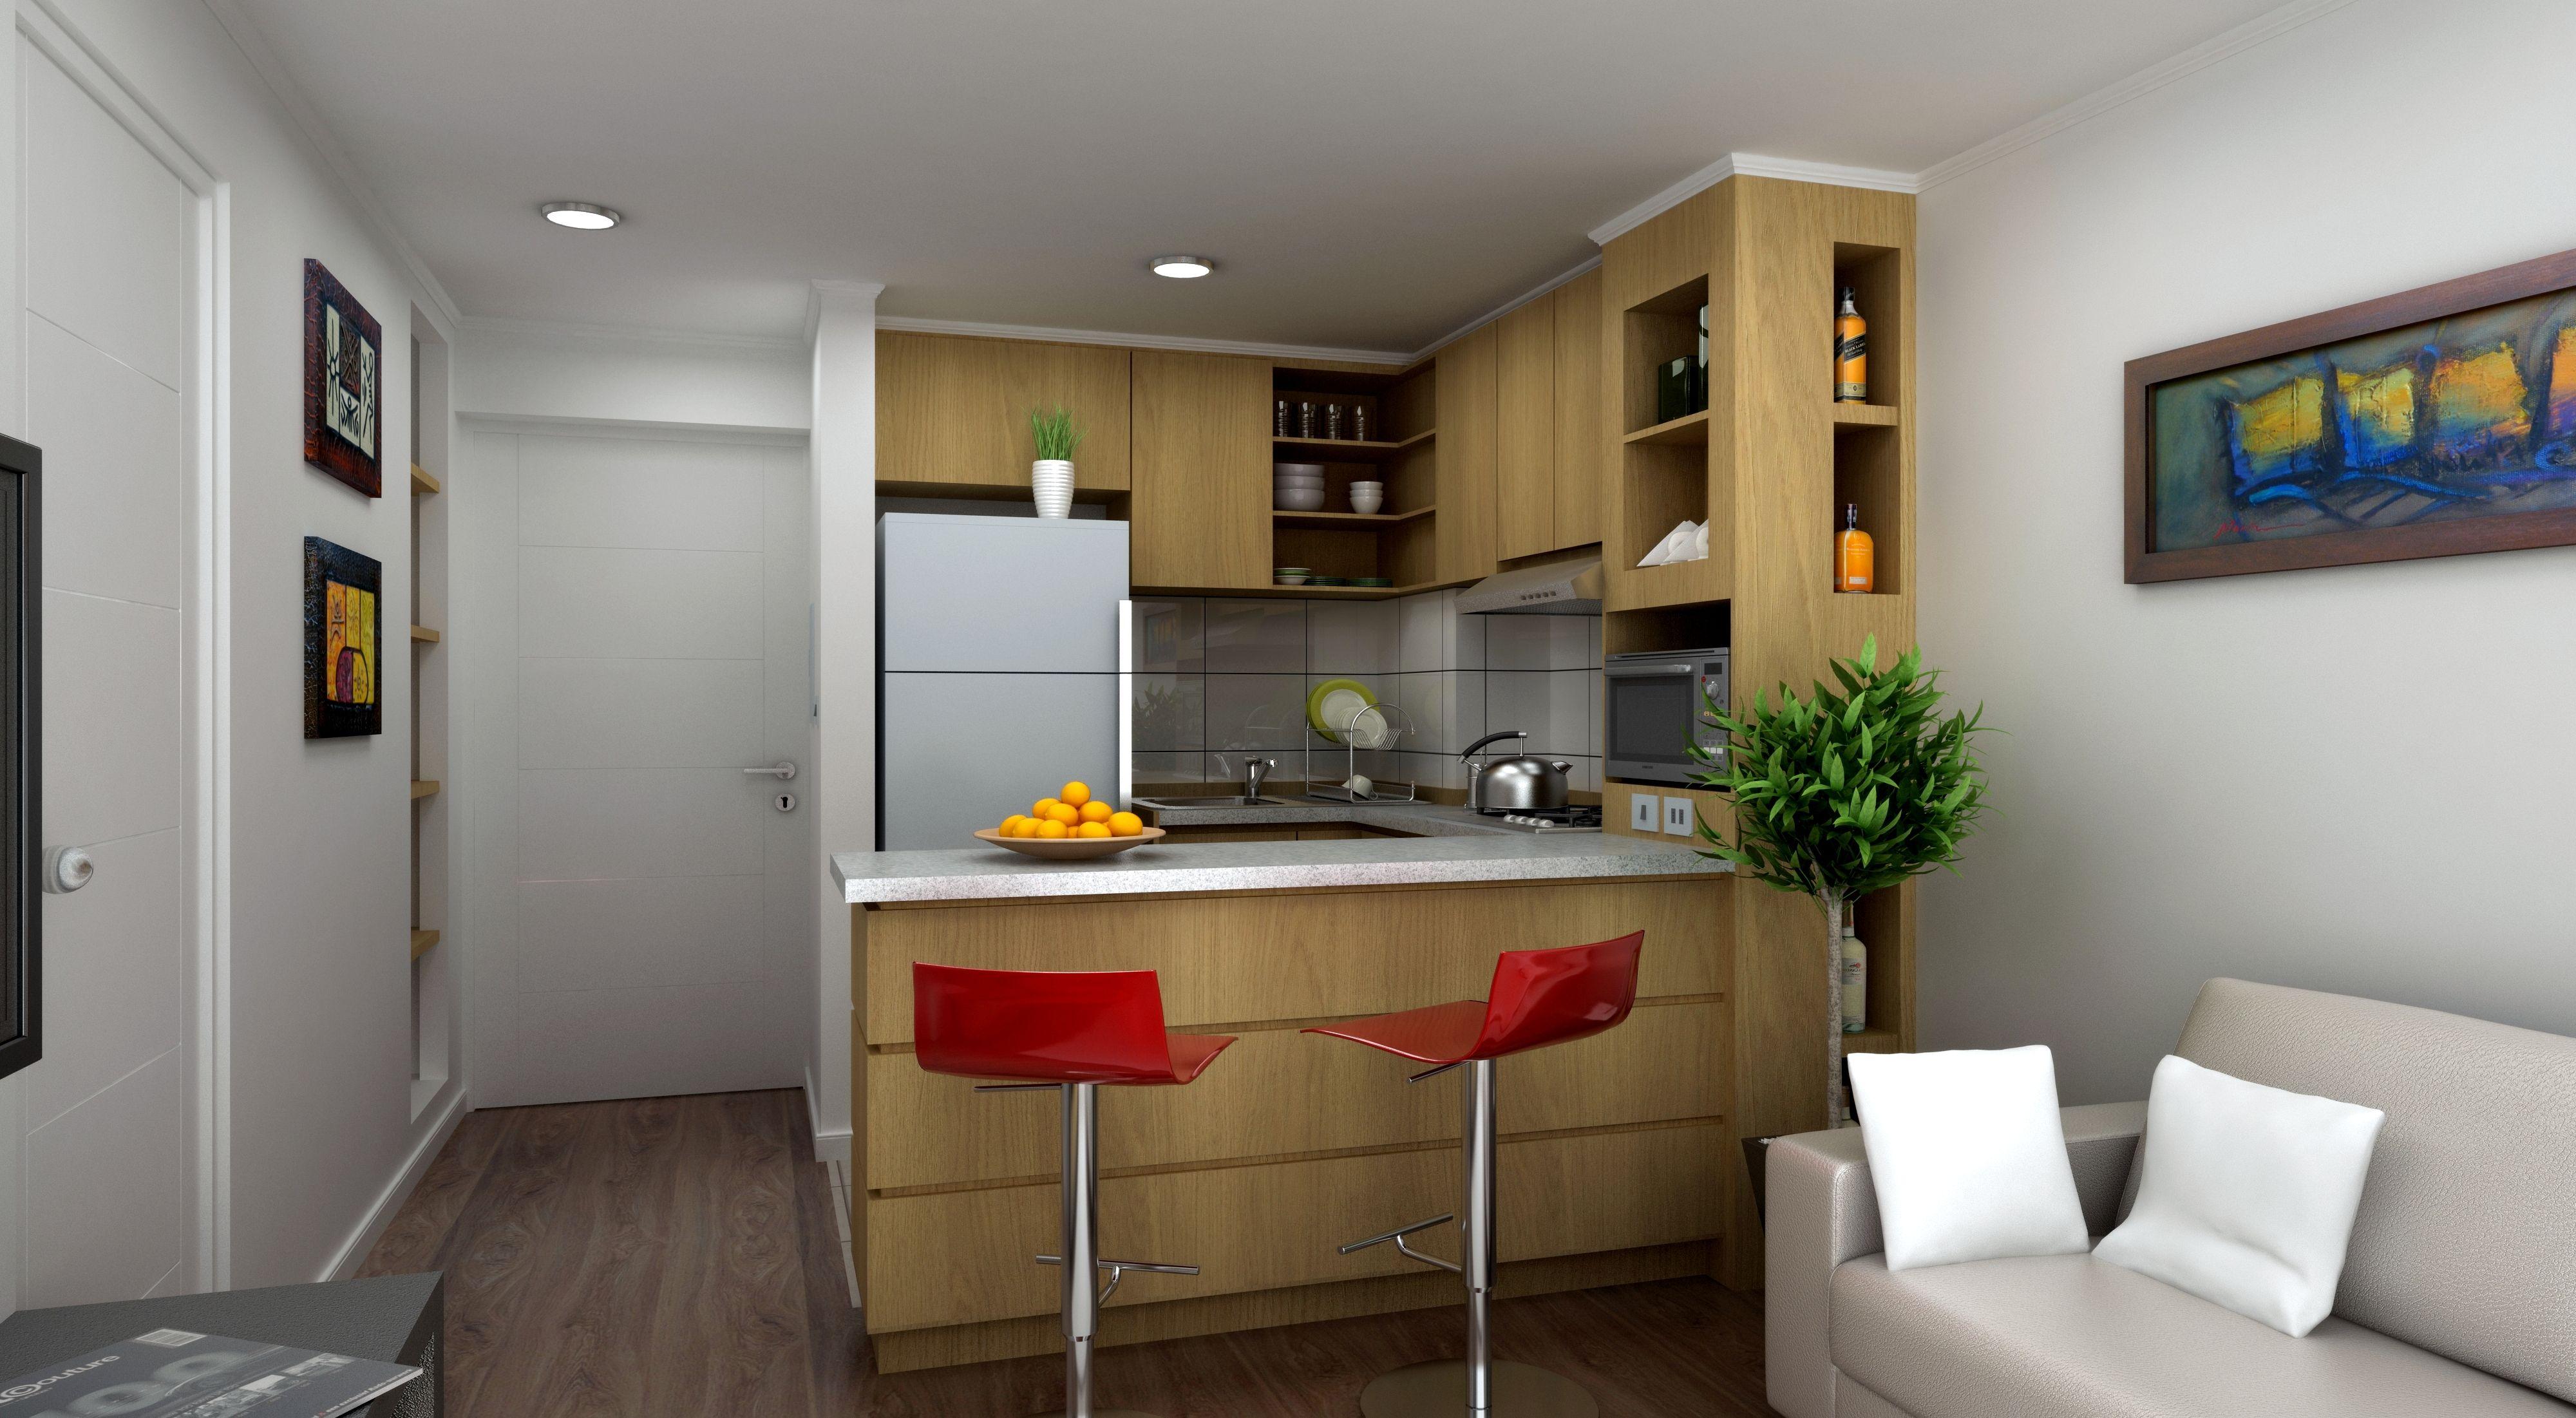 Cocinas americanas proyecto altavista pinterest for Proyecto cocina pequena